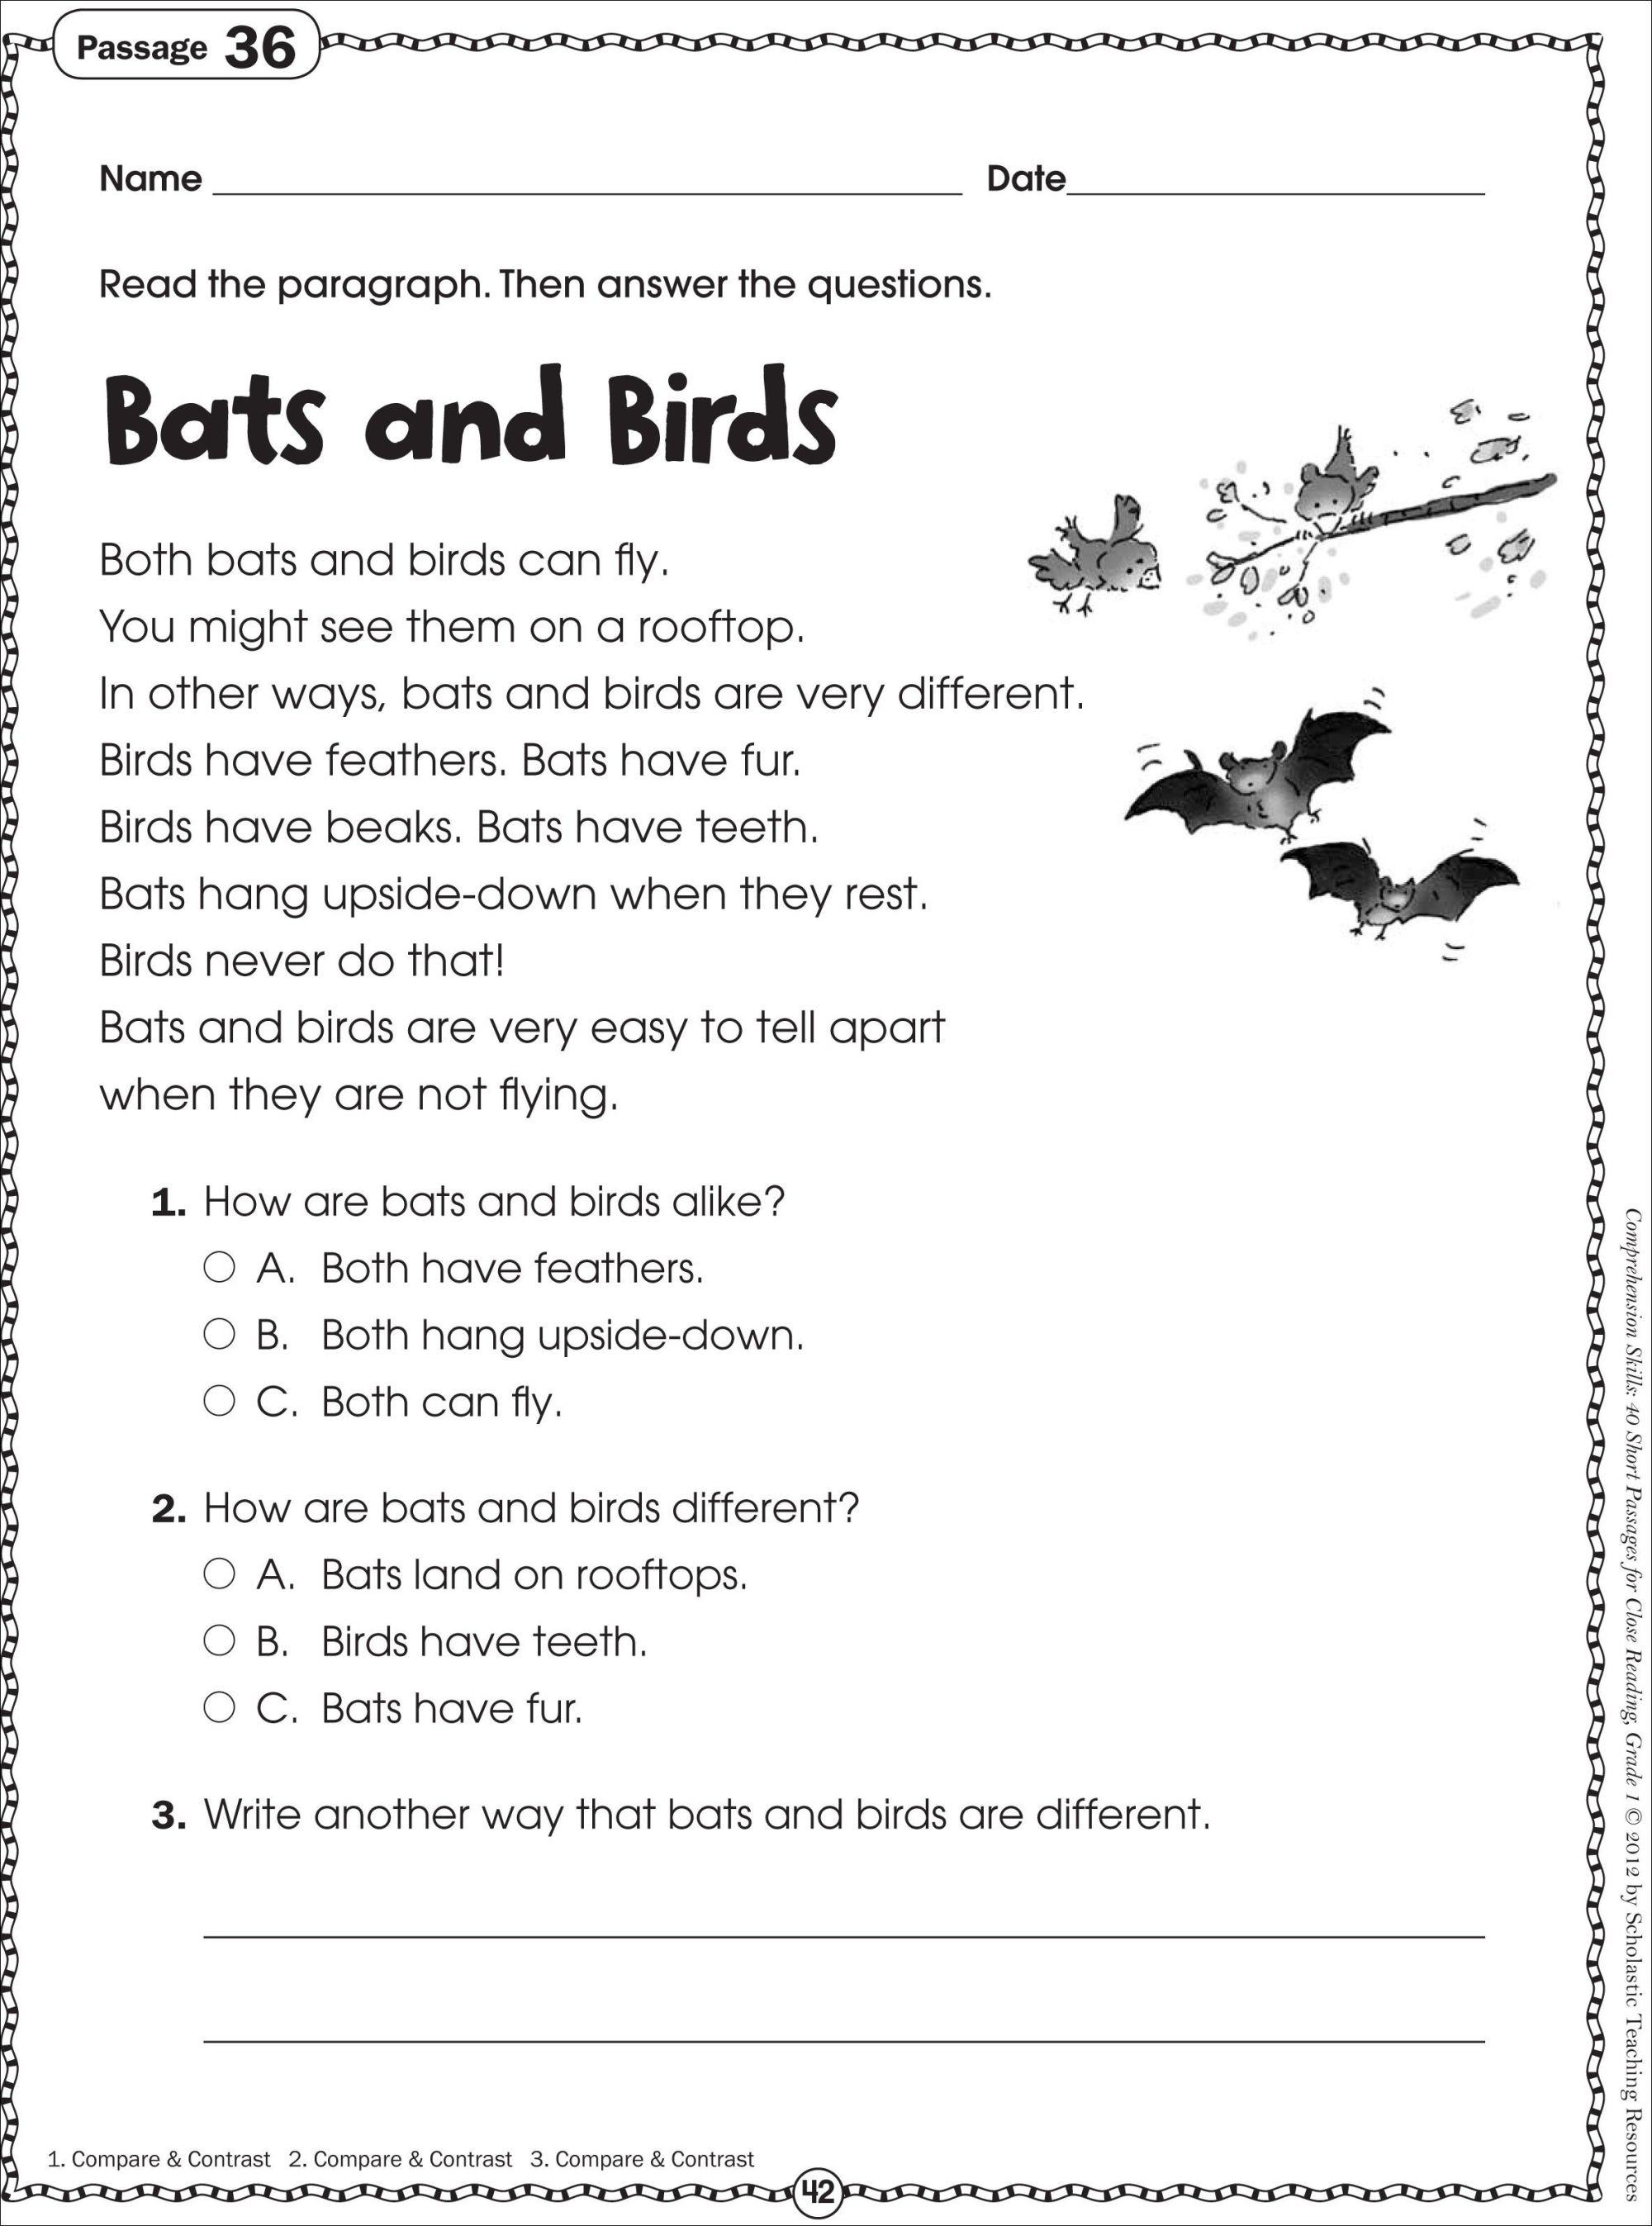 hight resolution of 16 Best Grade 3 Reading Comprehension Worksheets images on Best Worksheets  Collection